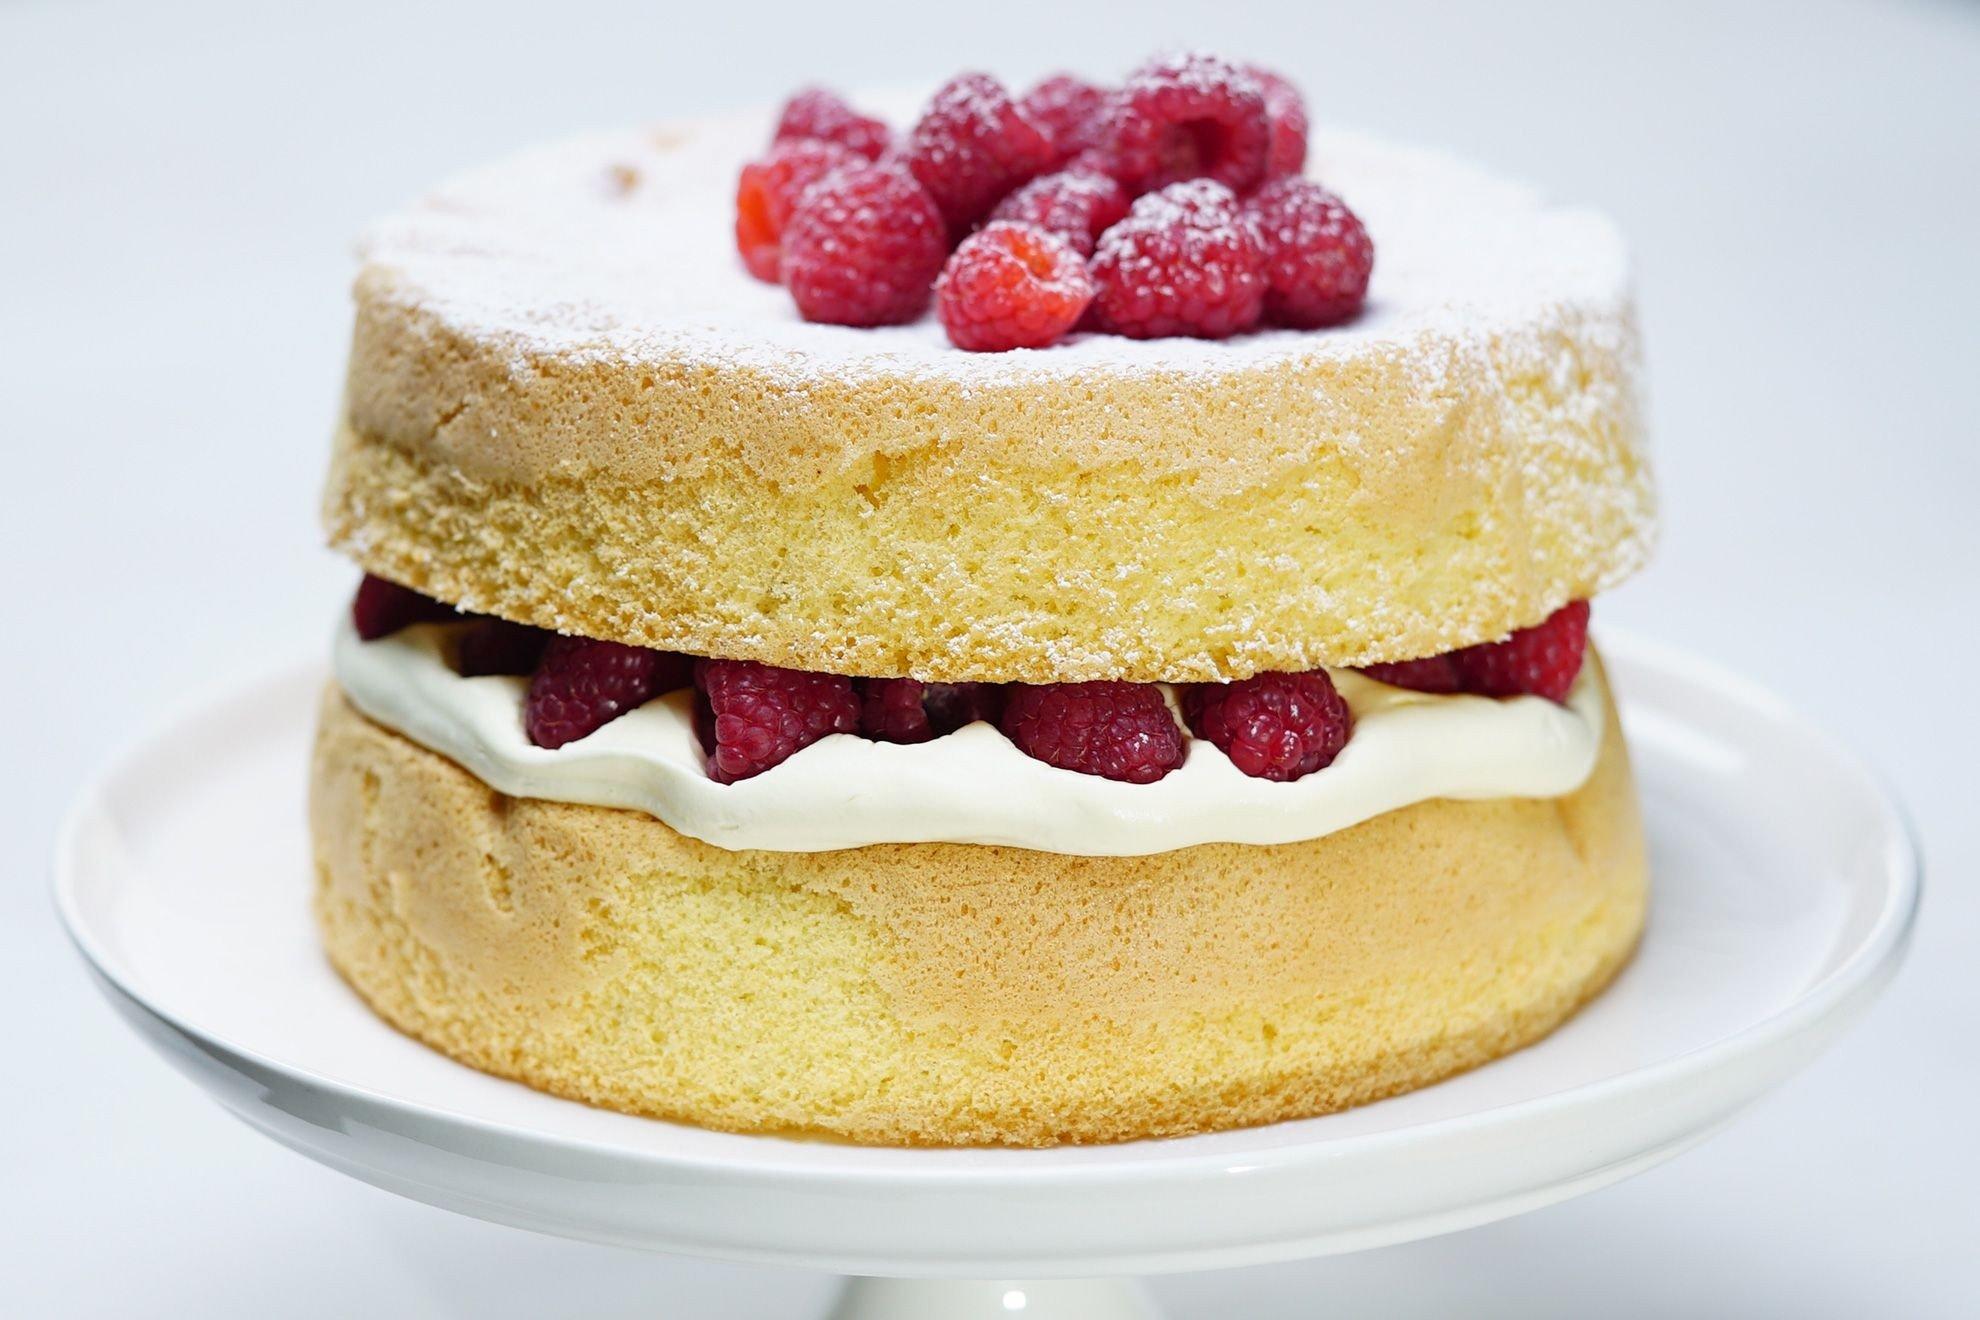 картинки тортов бисквит вопрос абсолютно теме